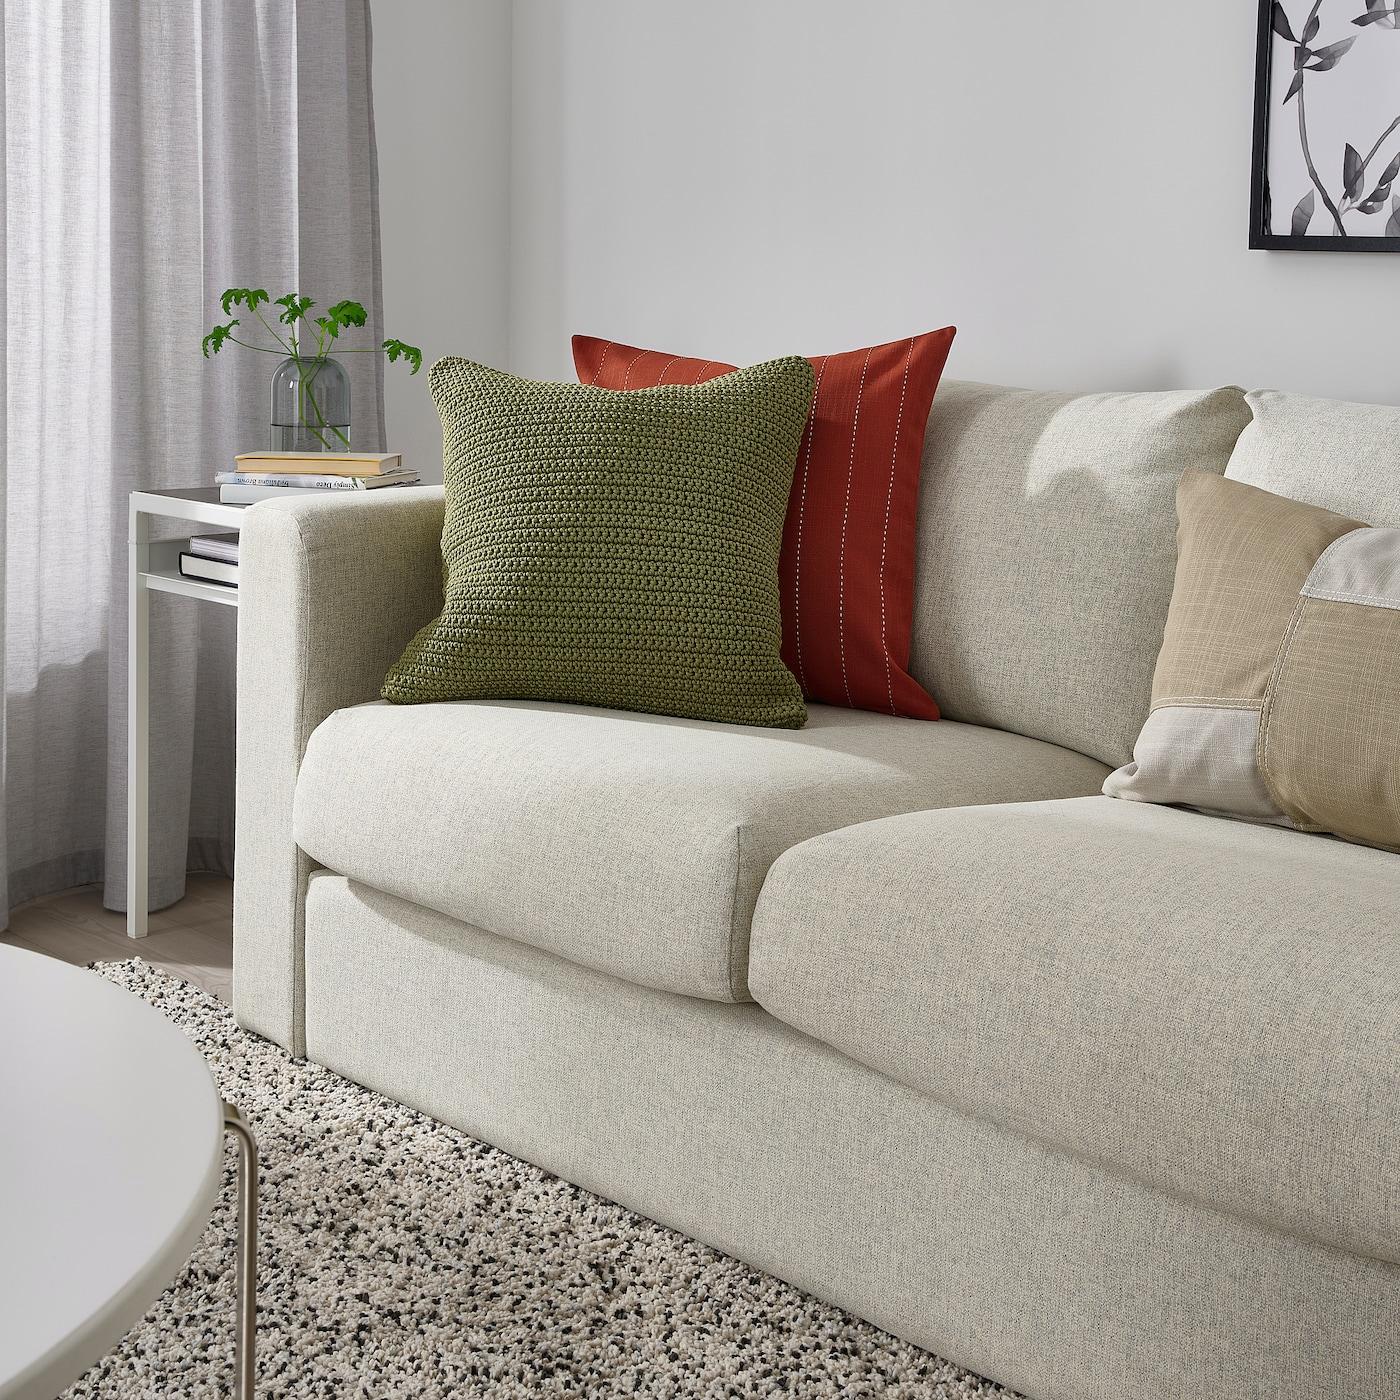 SÖTHOLMEN Fodera per cuscino, interno/esterno, beige-verde, 50x50 cm